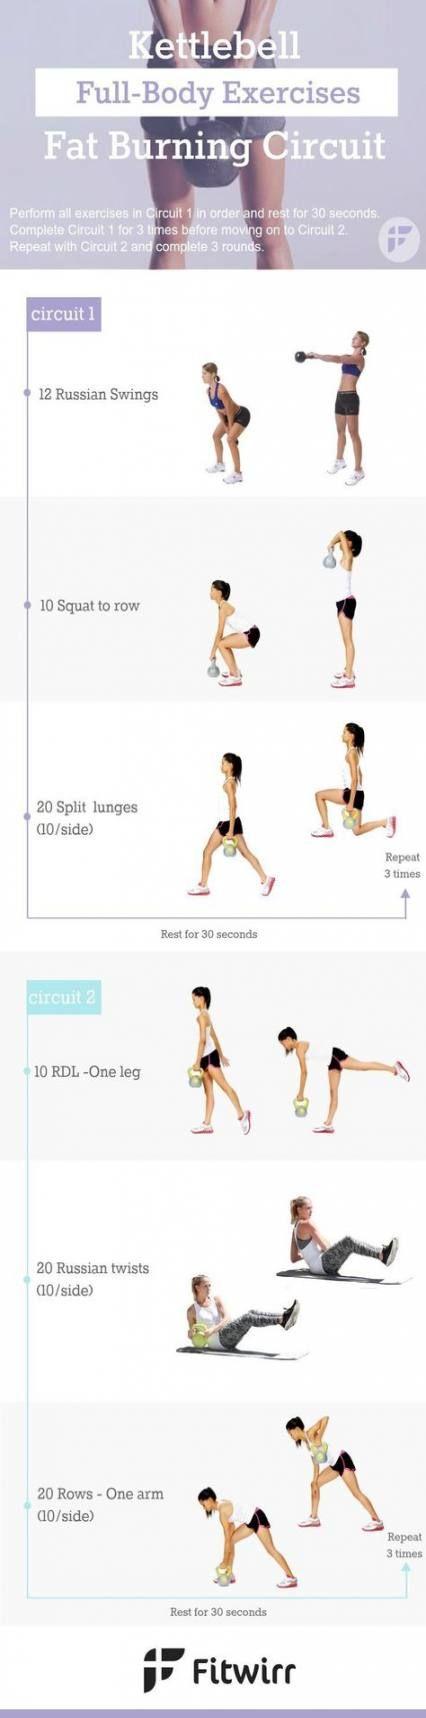 Fitness inspiration running full body 44+ super Ideas #fitness